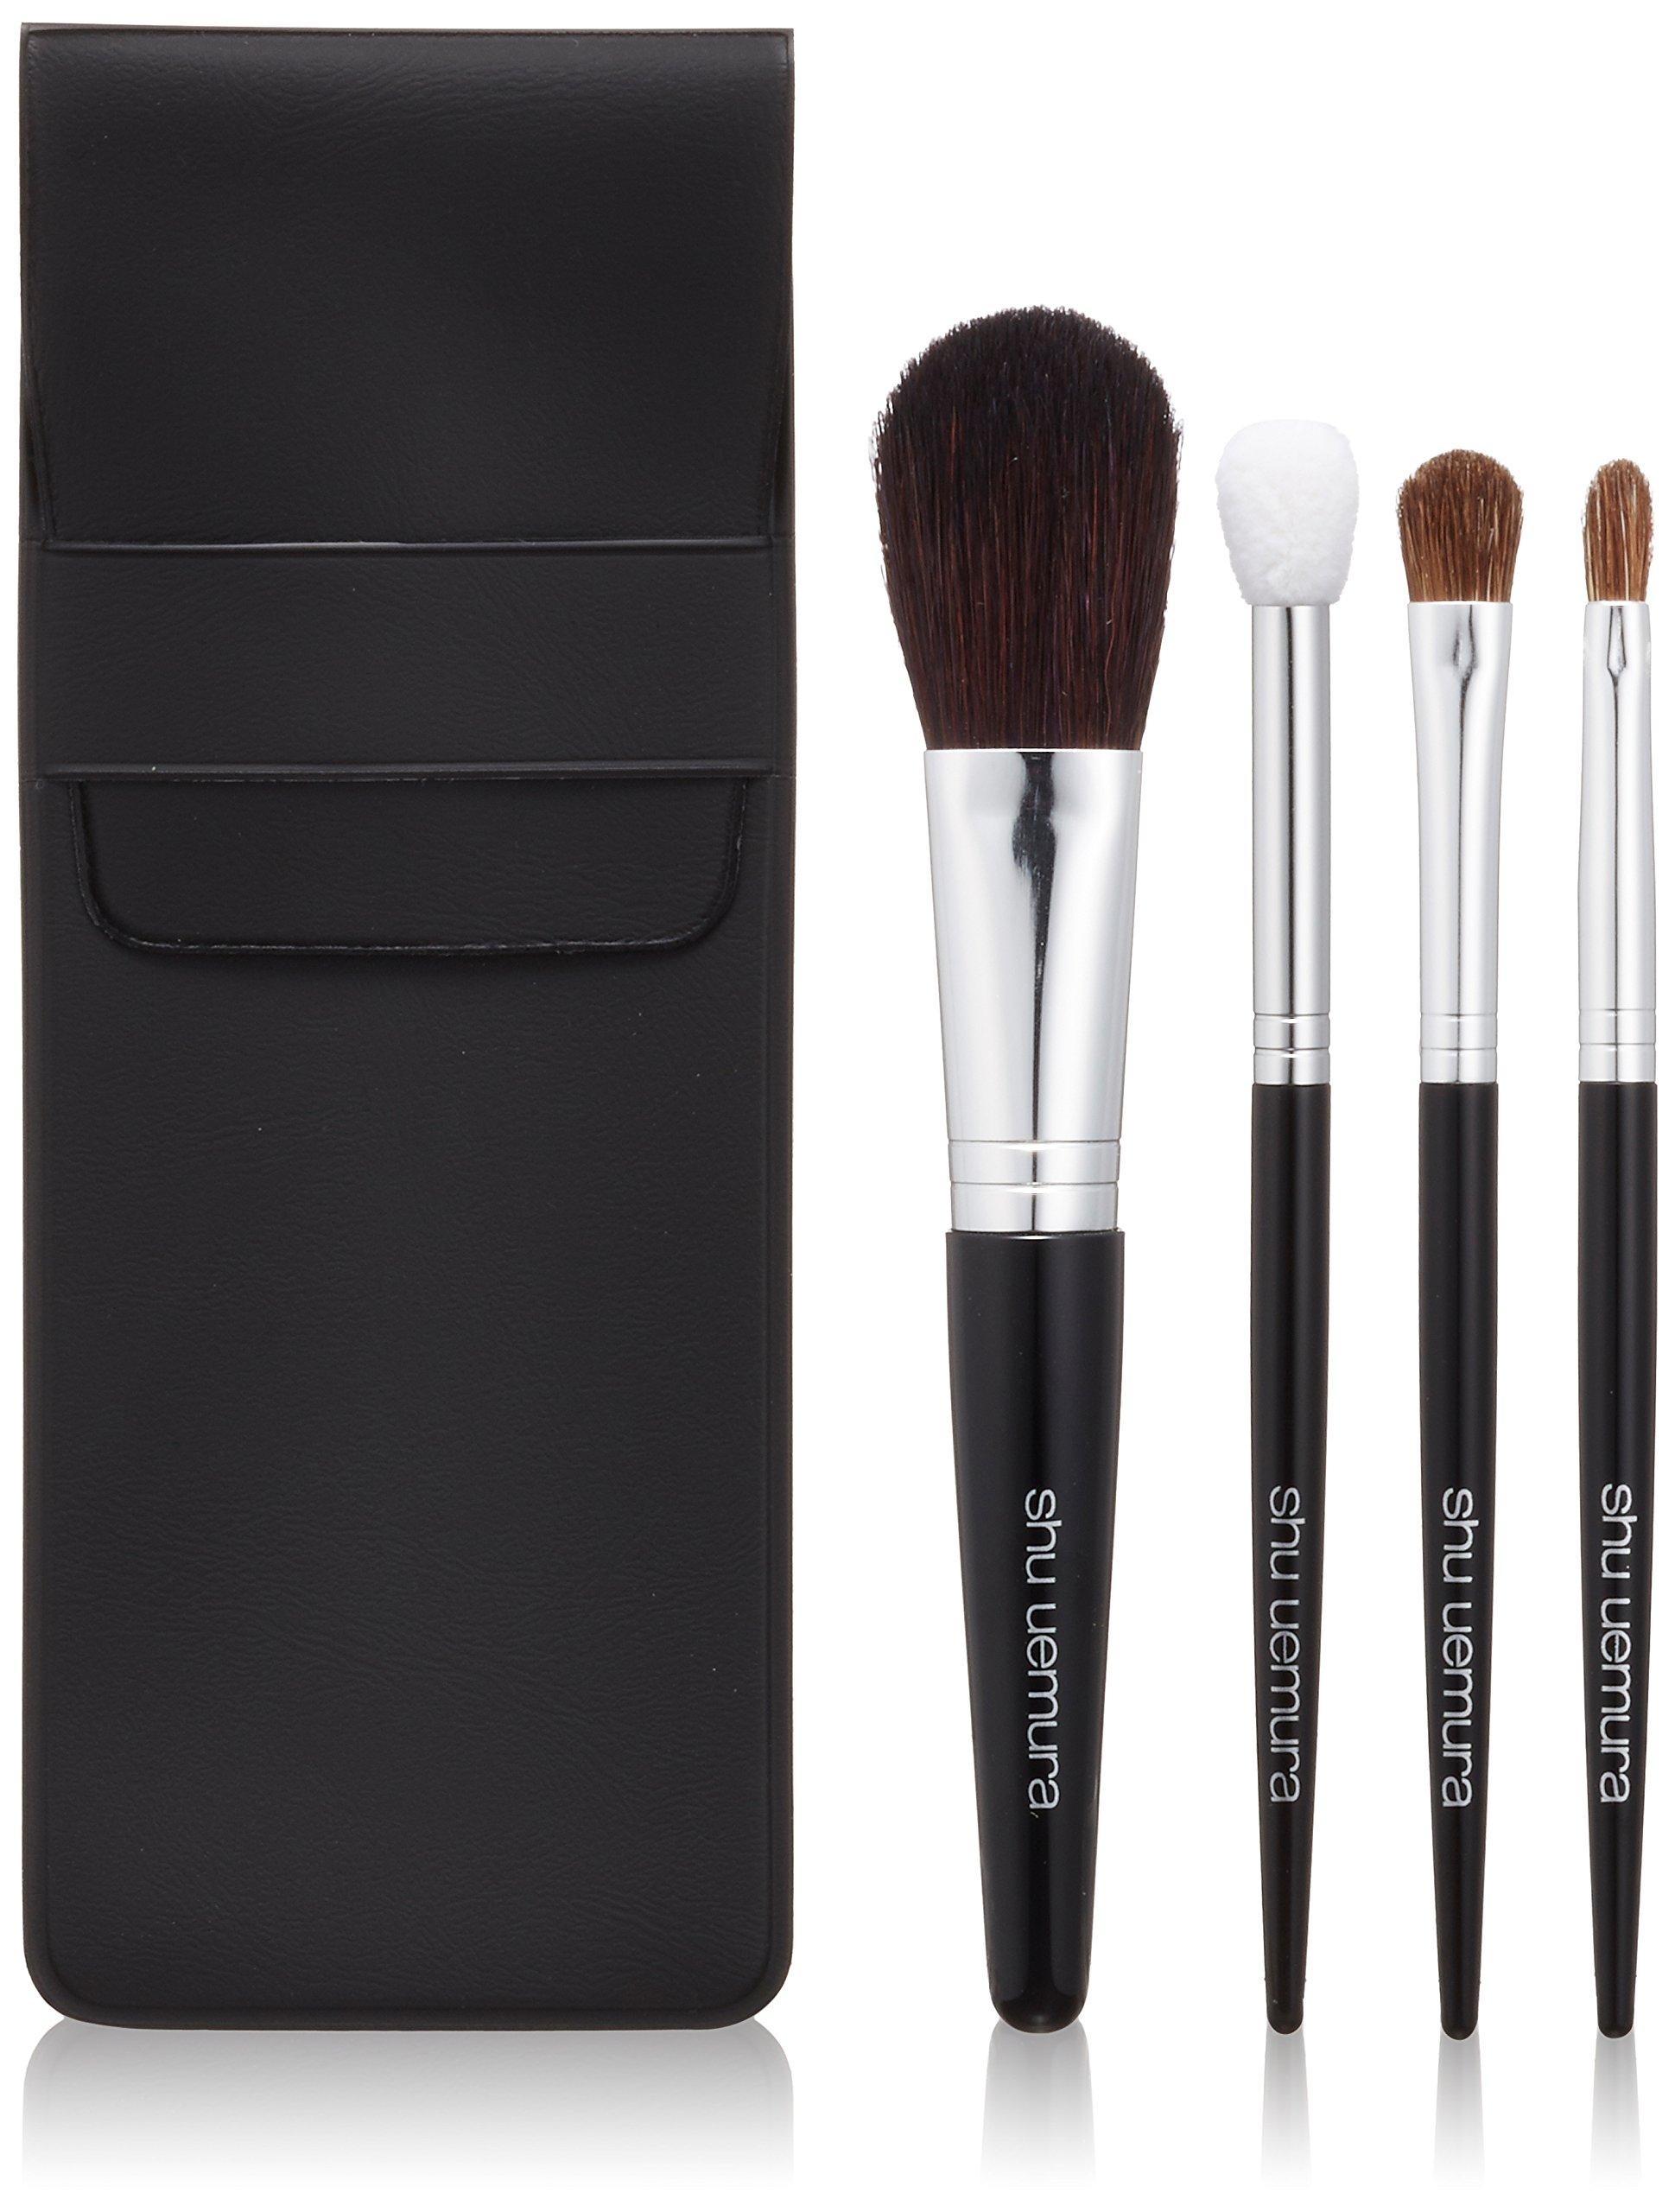 Shu Uemura - Natural Portable Brush Set (For Cheeks, Eye Shadow, Lips) - -